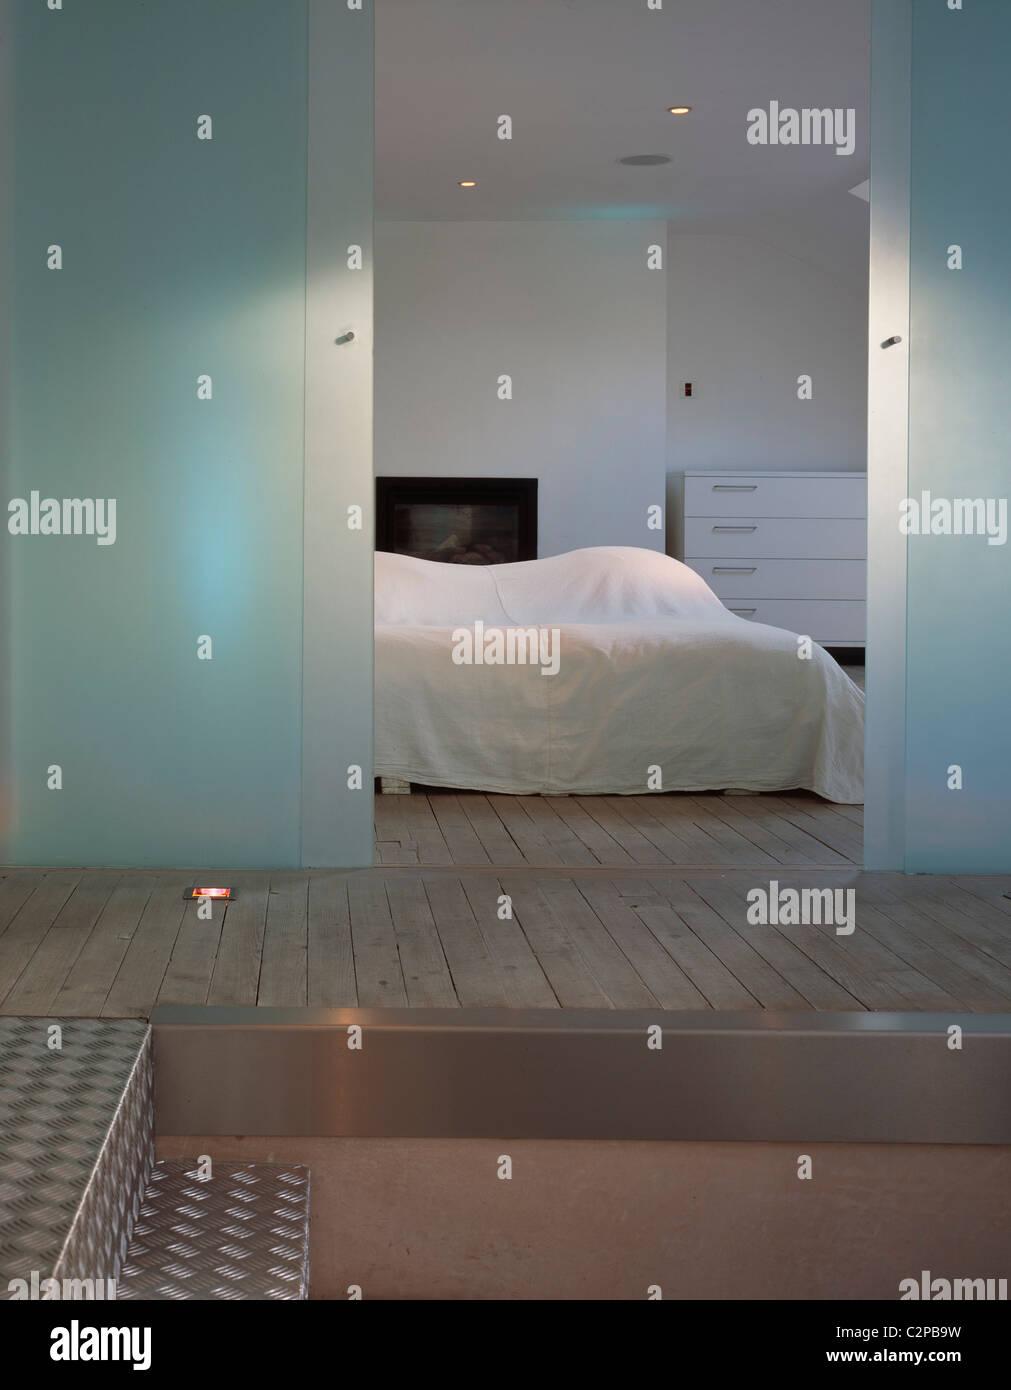 Bedrooms Stairs Stockfotos & Bedrooms Stairs Bilder - Alamy